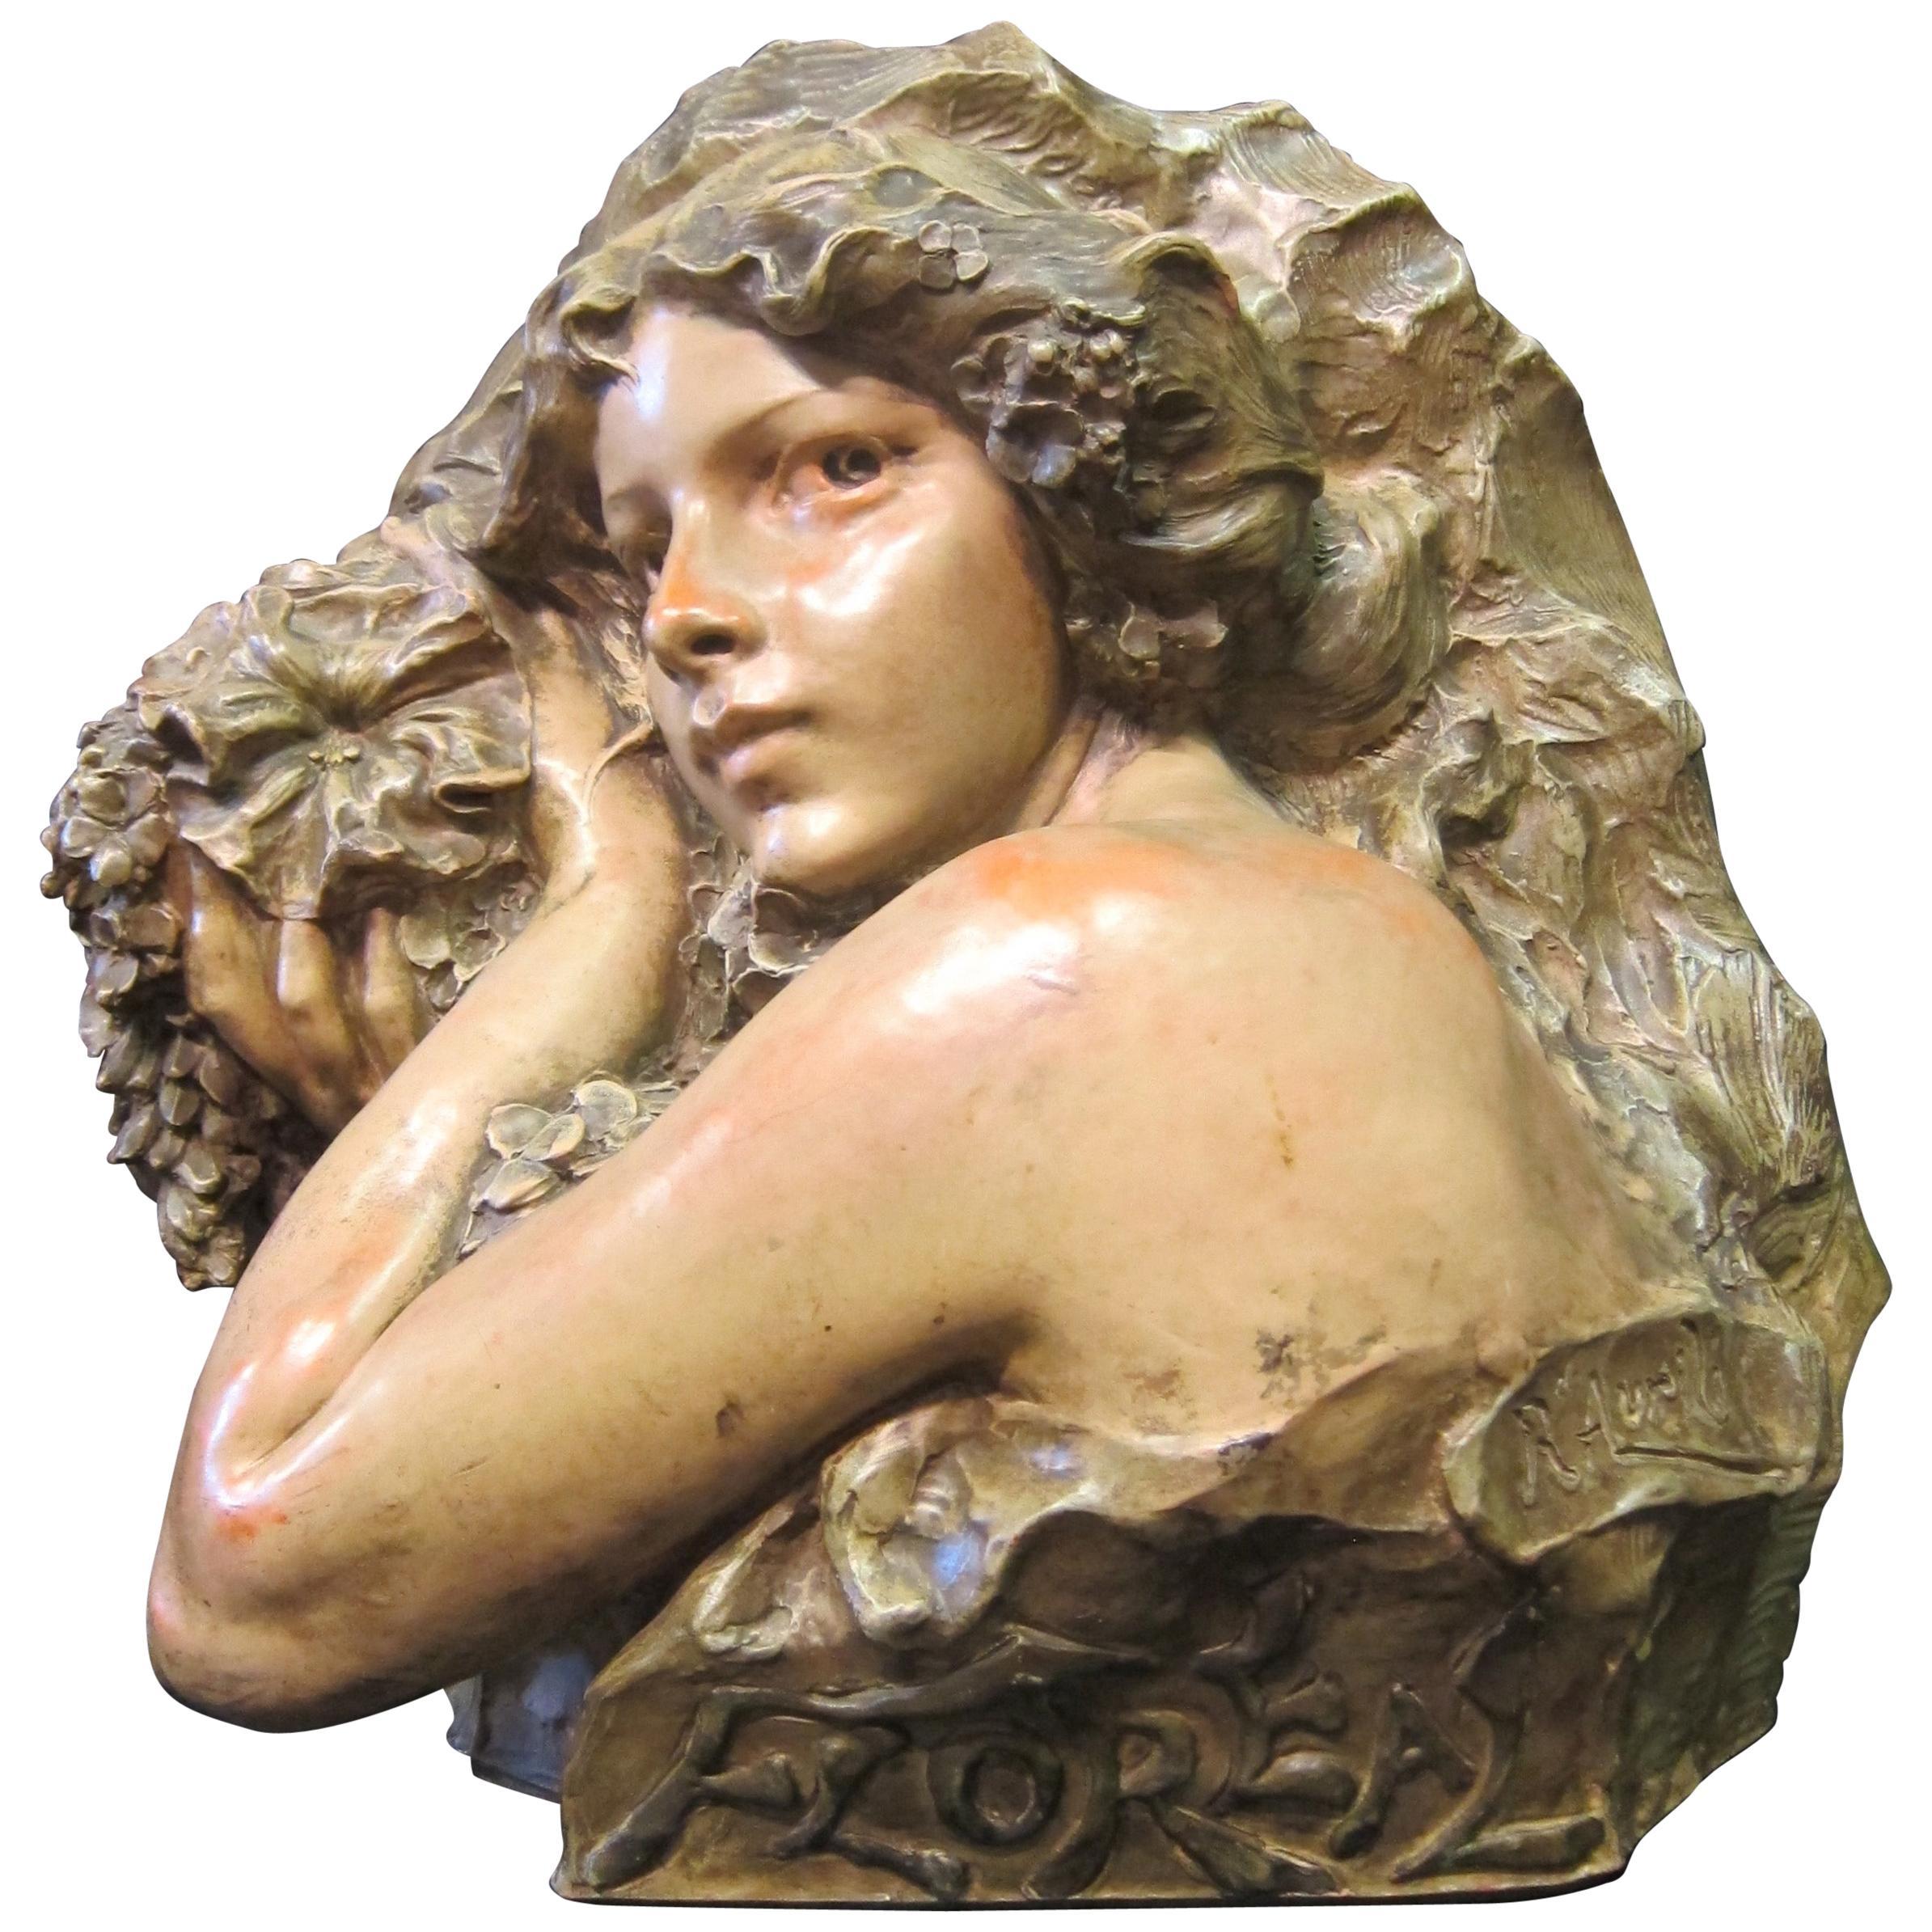 Art Nouveau Sculpture in Terra Cotta